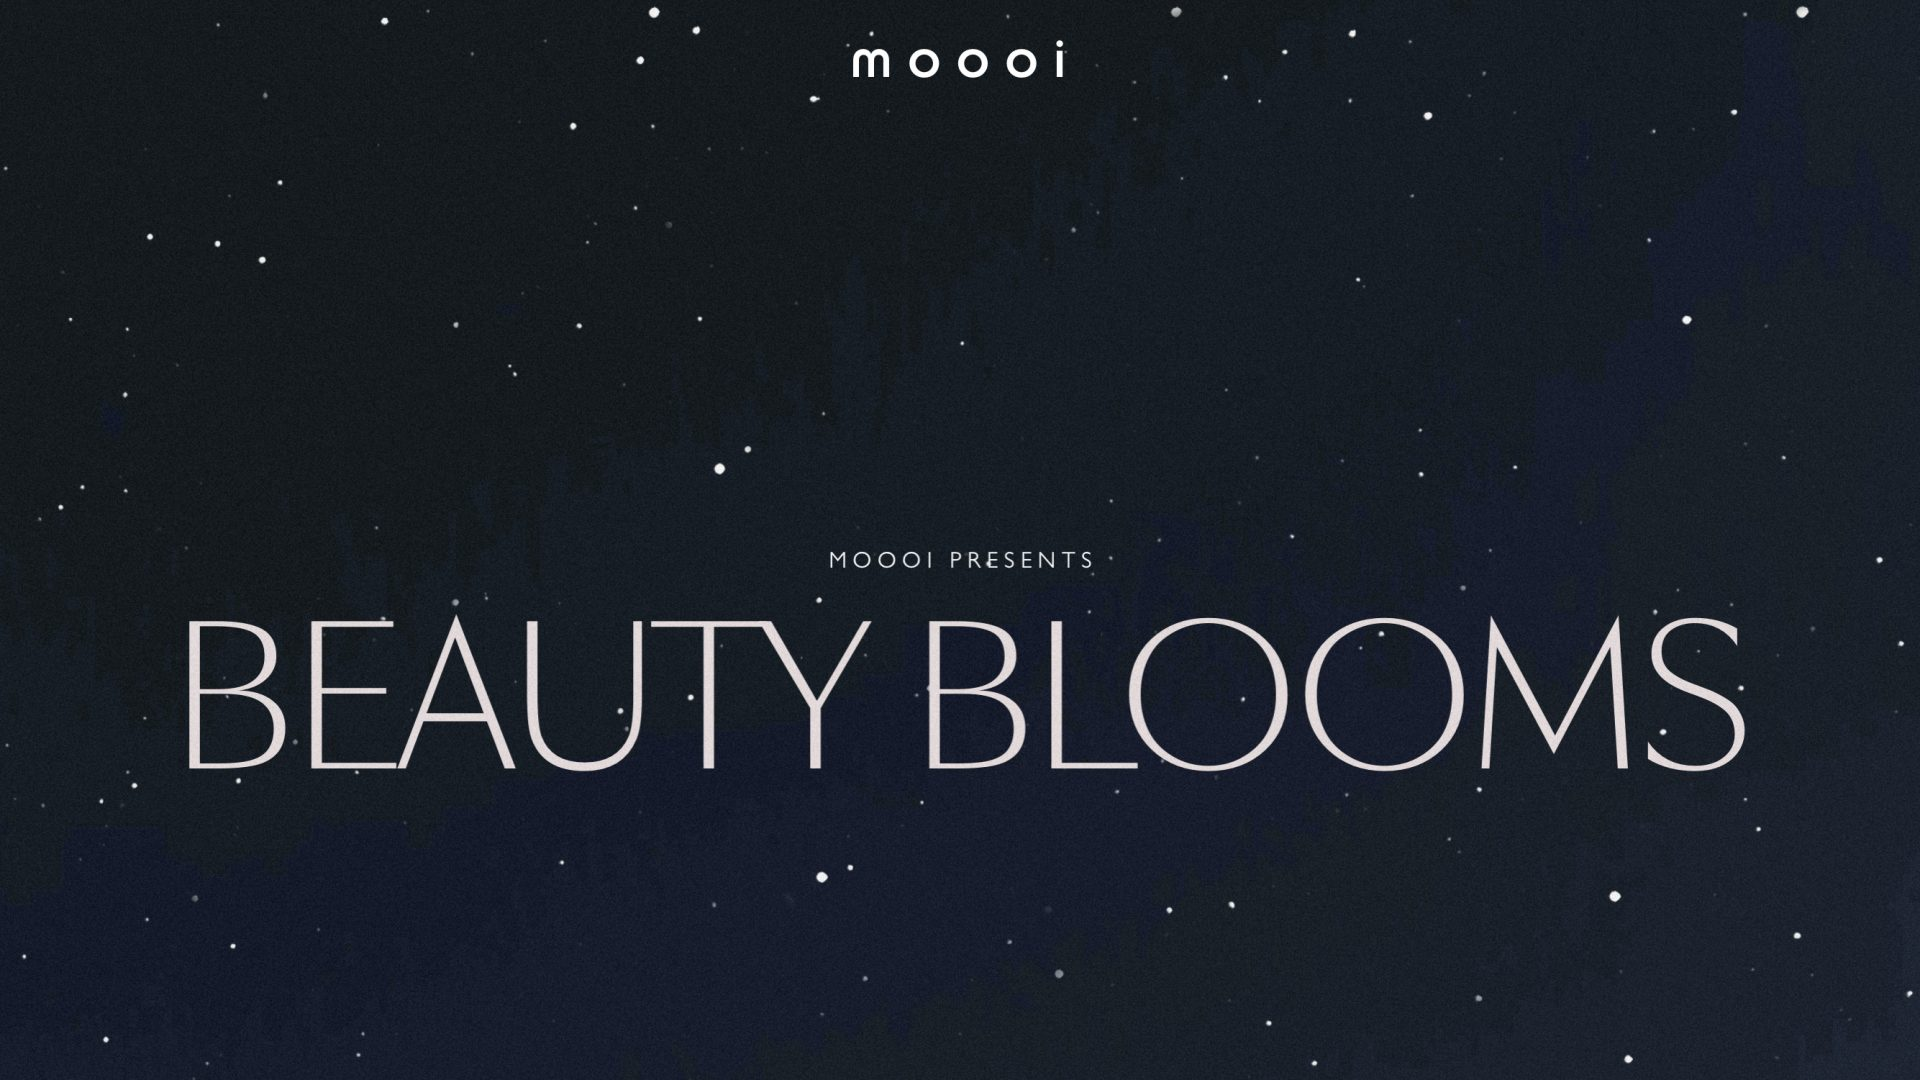 Best Ecommerce Website for Moooi